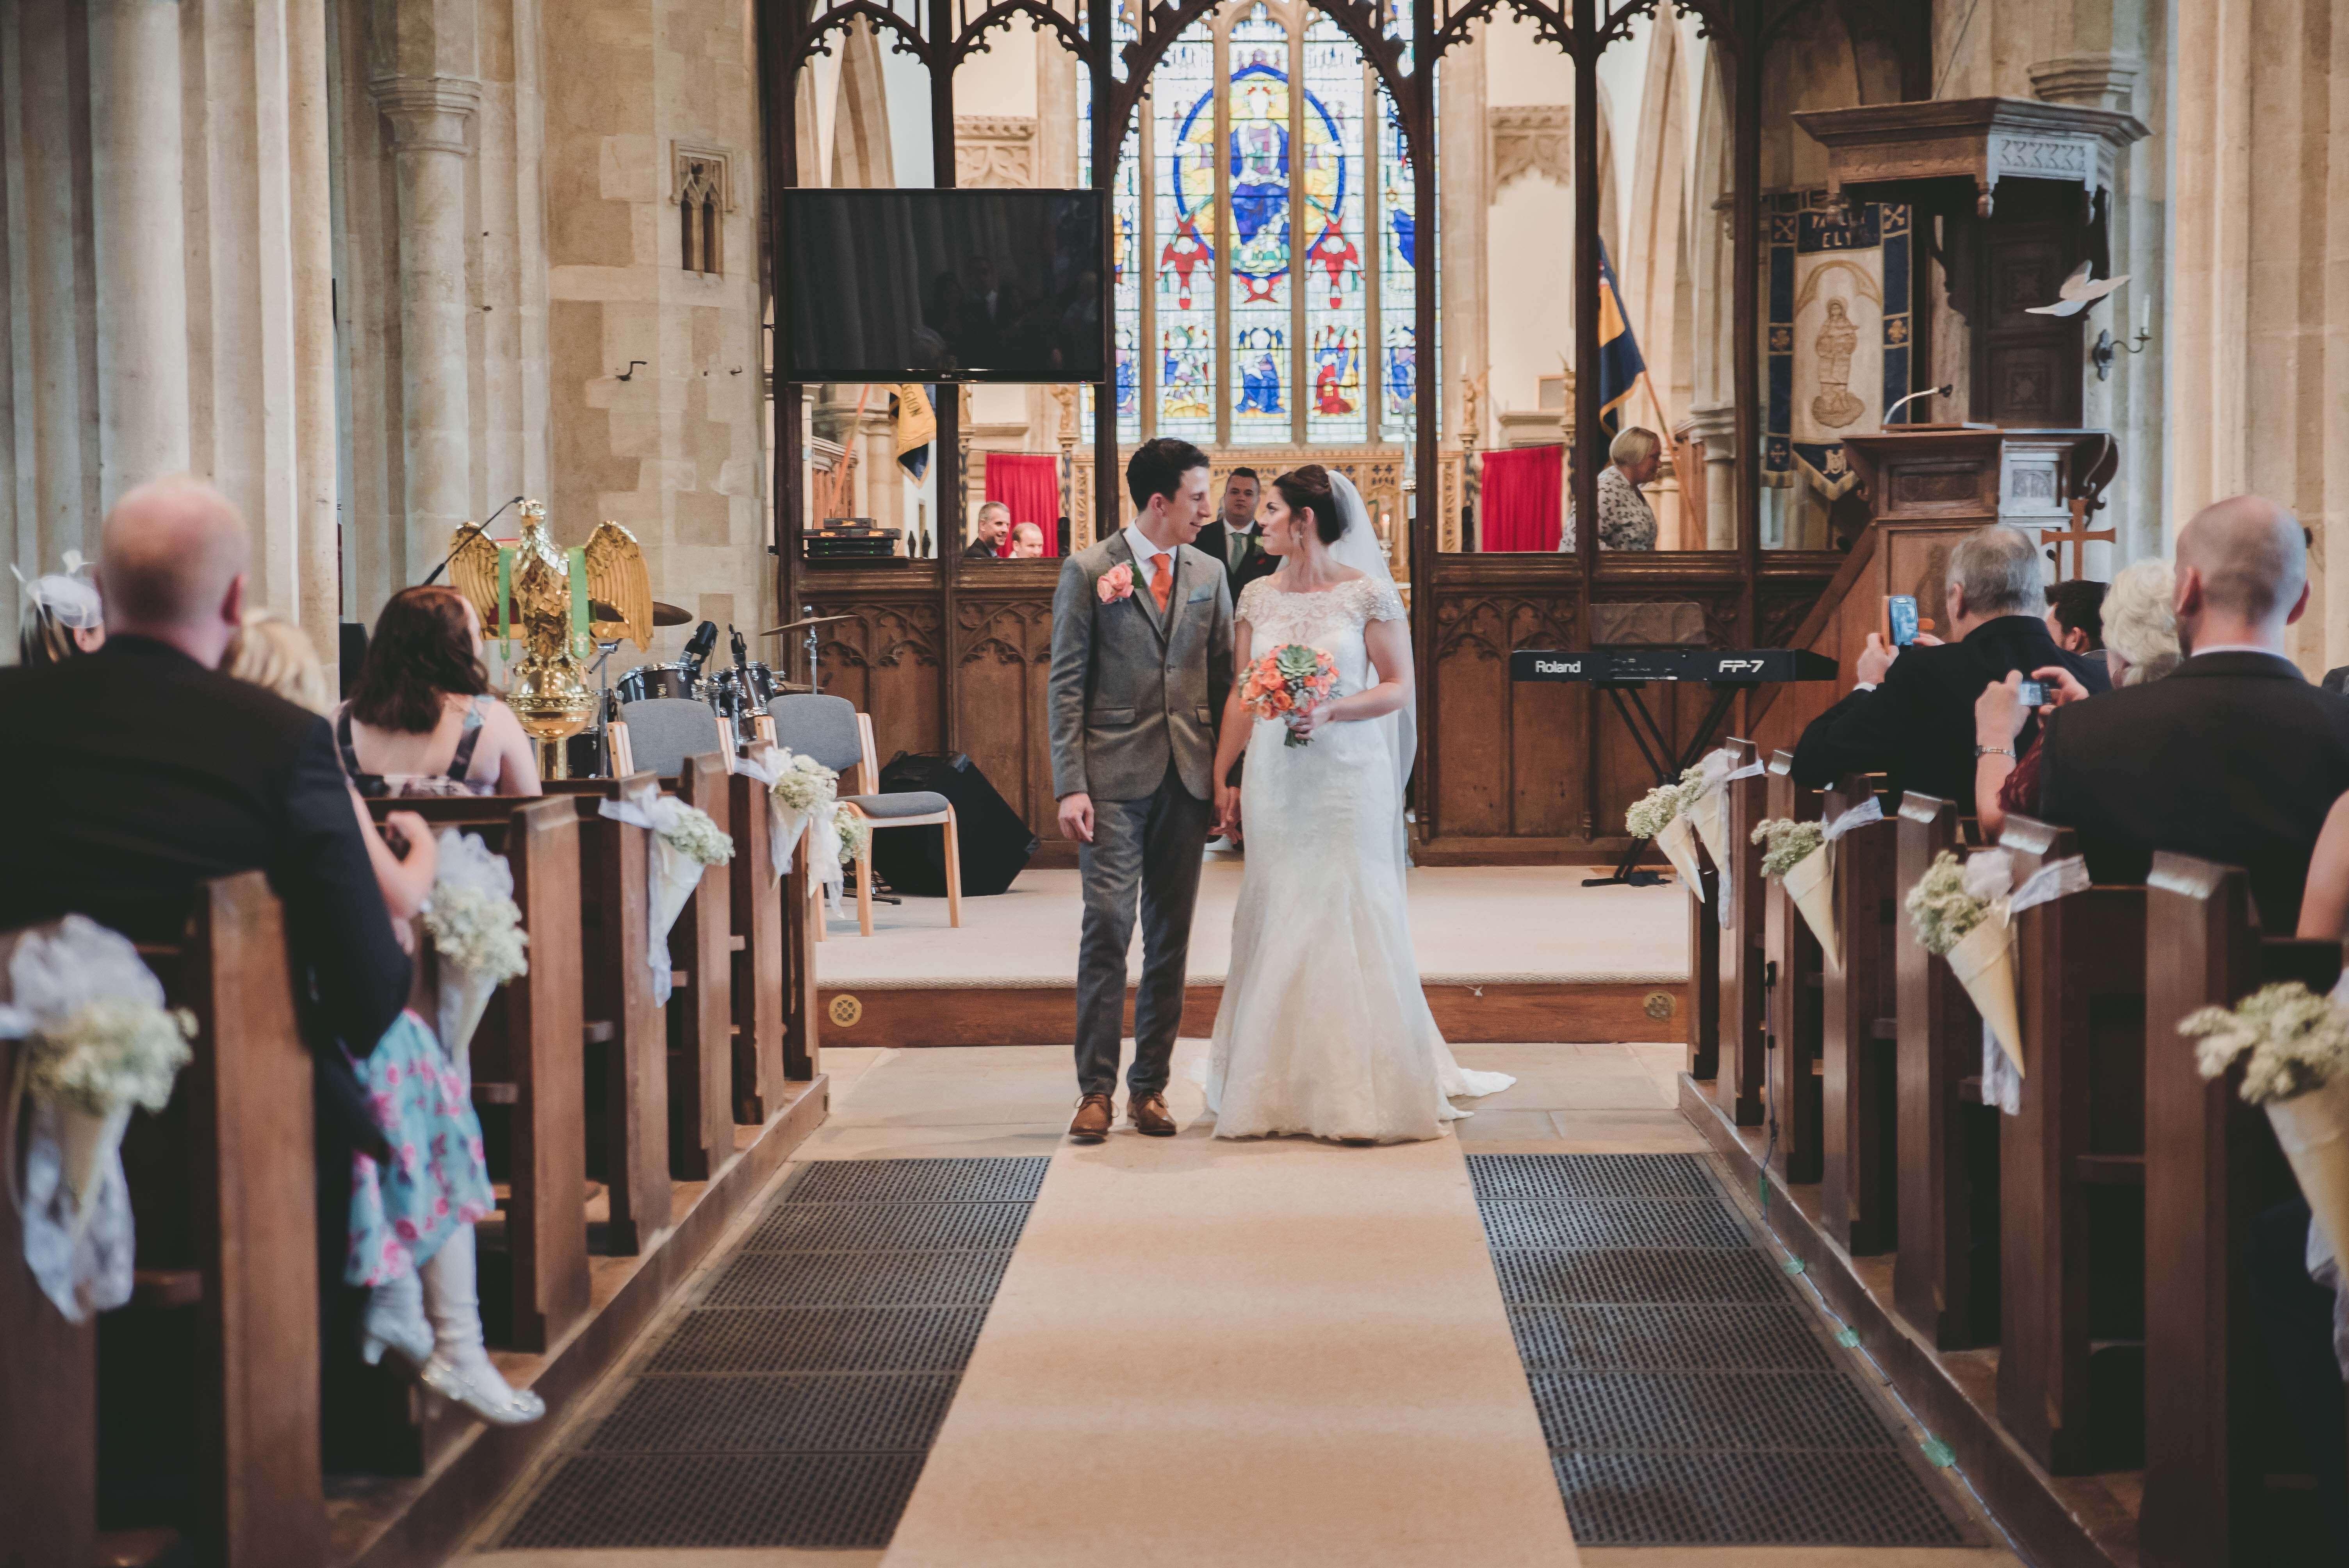 Haycock Hotel Wansford Wedding 18 10 2016 27